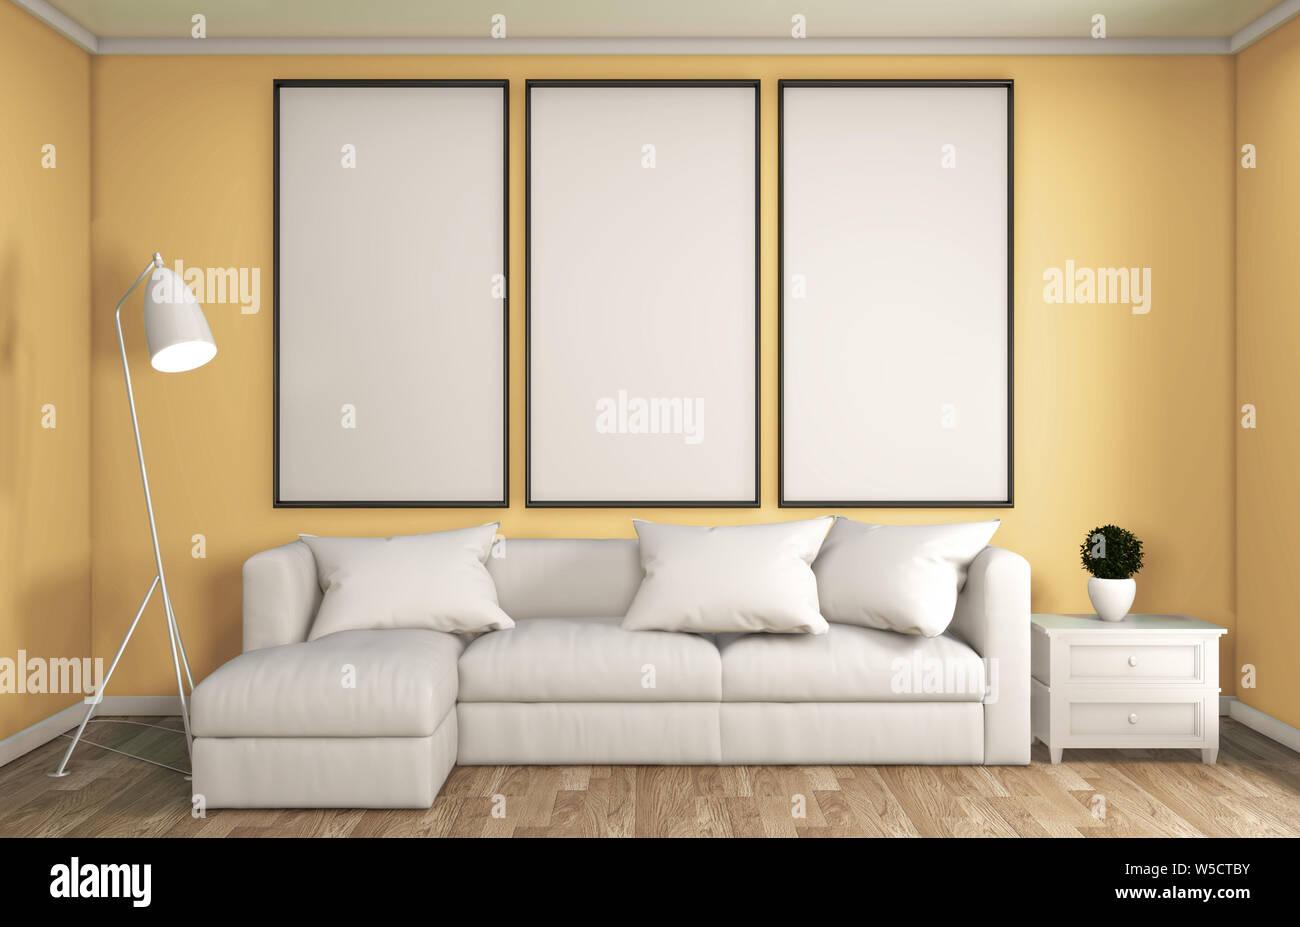 Mock Up Yellow Living Room Decoration Japanese Style Designed Minimal Zen Style 3d Rendering Stock Photo Alamy